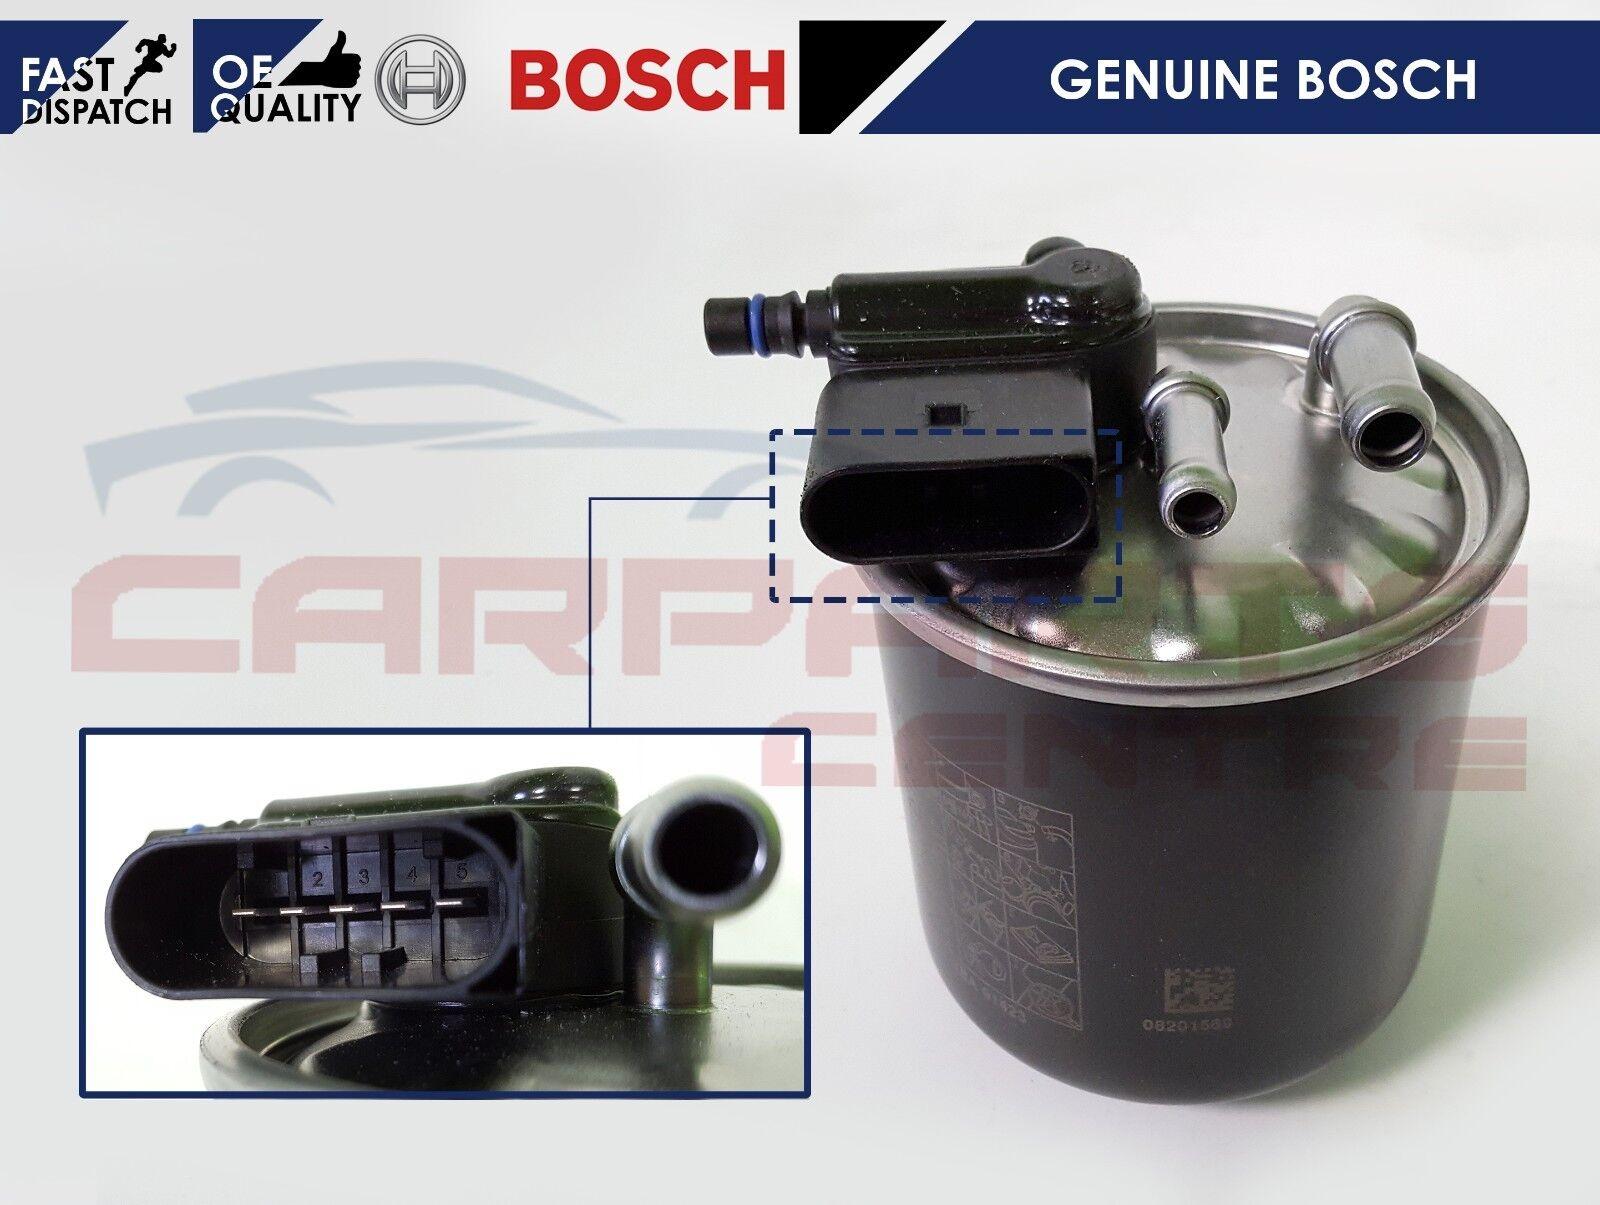 For Mercedes Vito Viano Sprinter 319 419 A 180 220 B 200 Bosch Fuel Filter